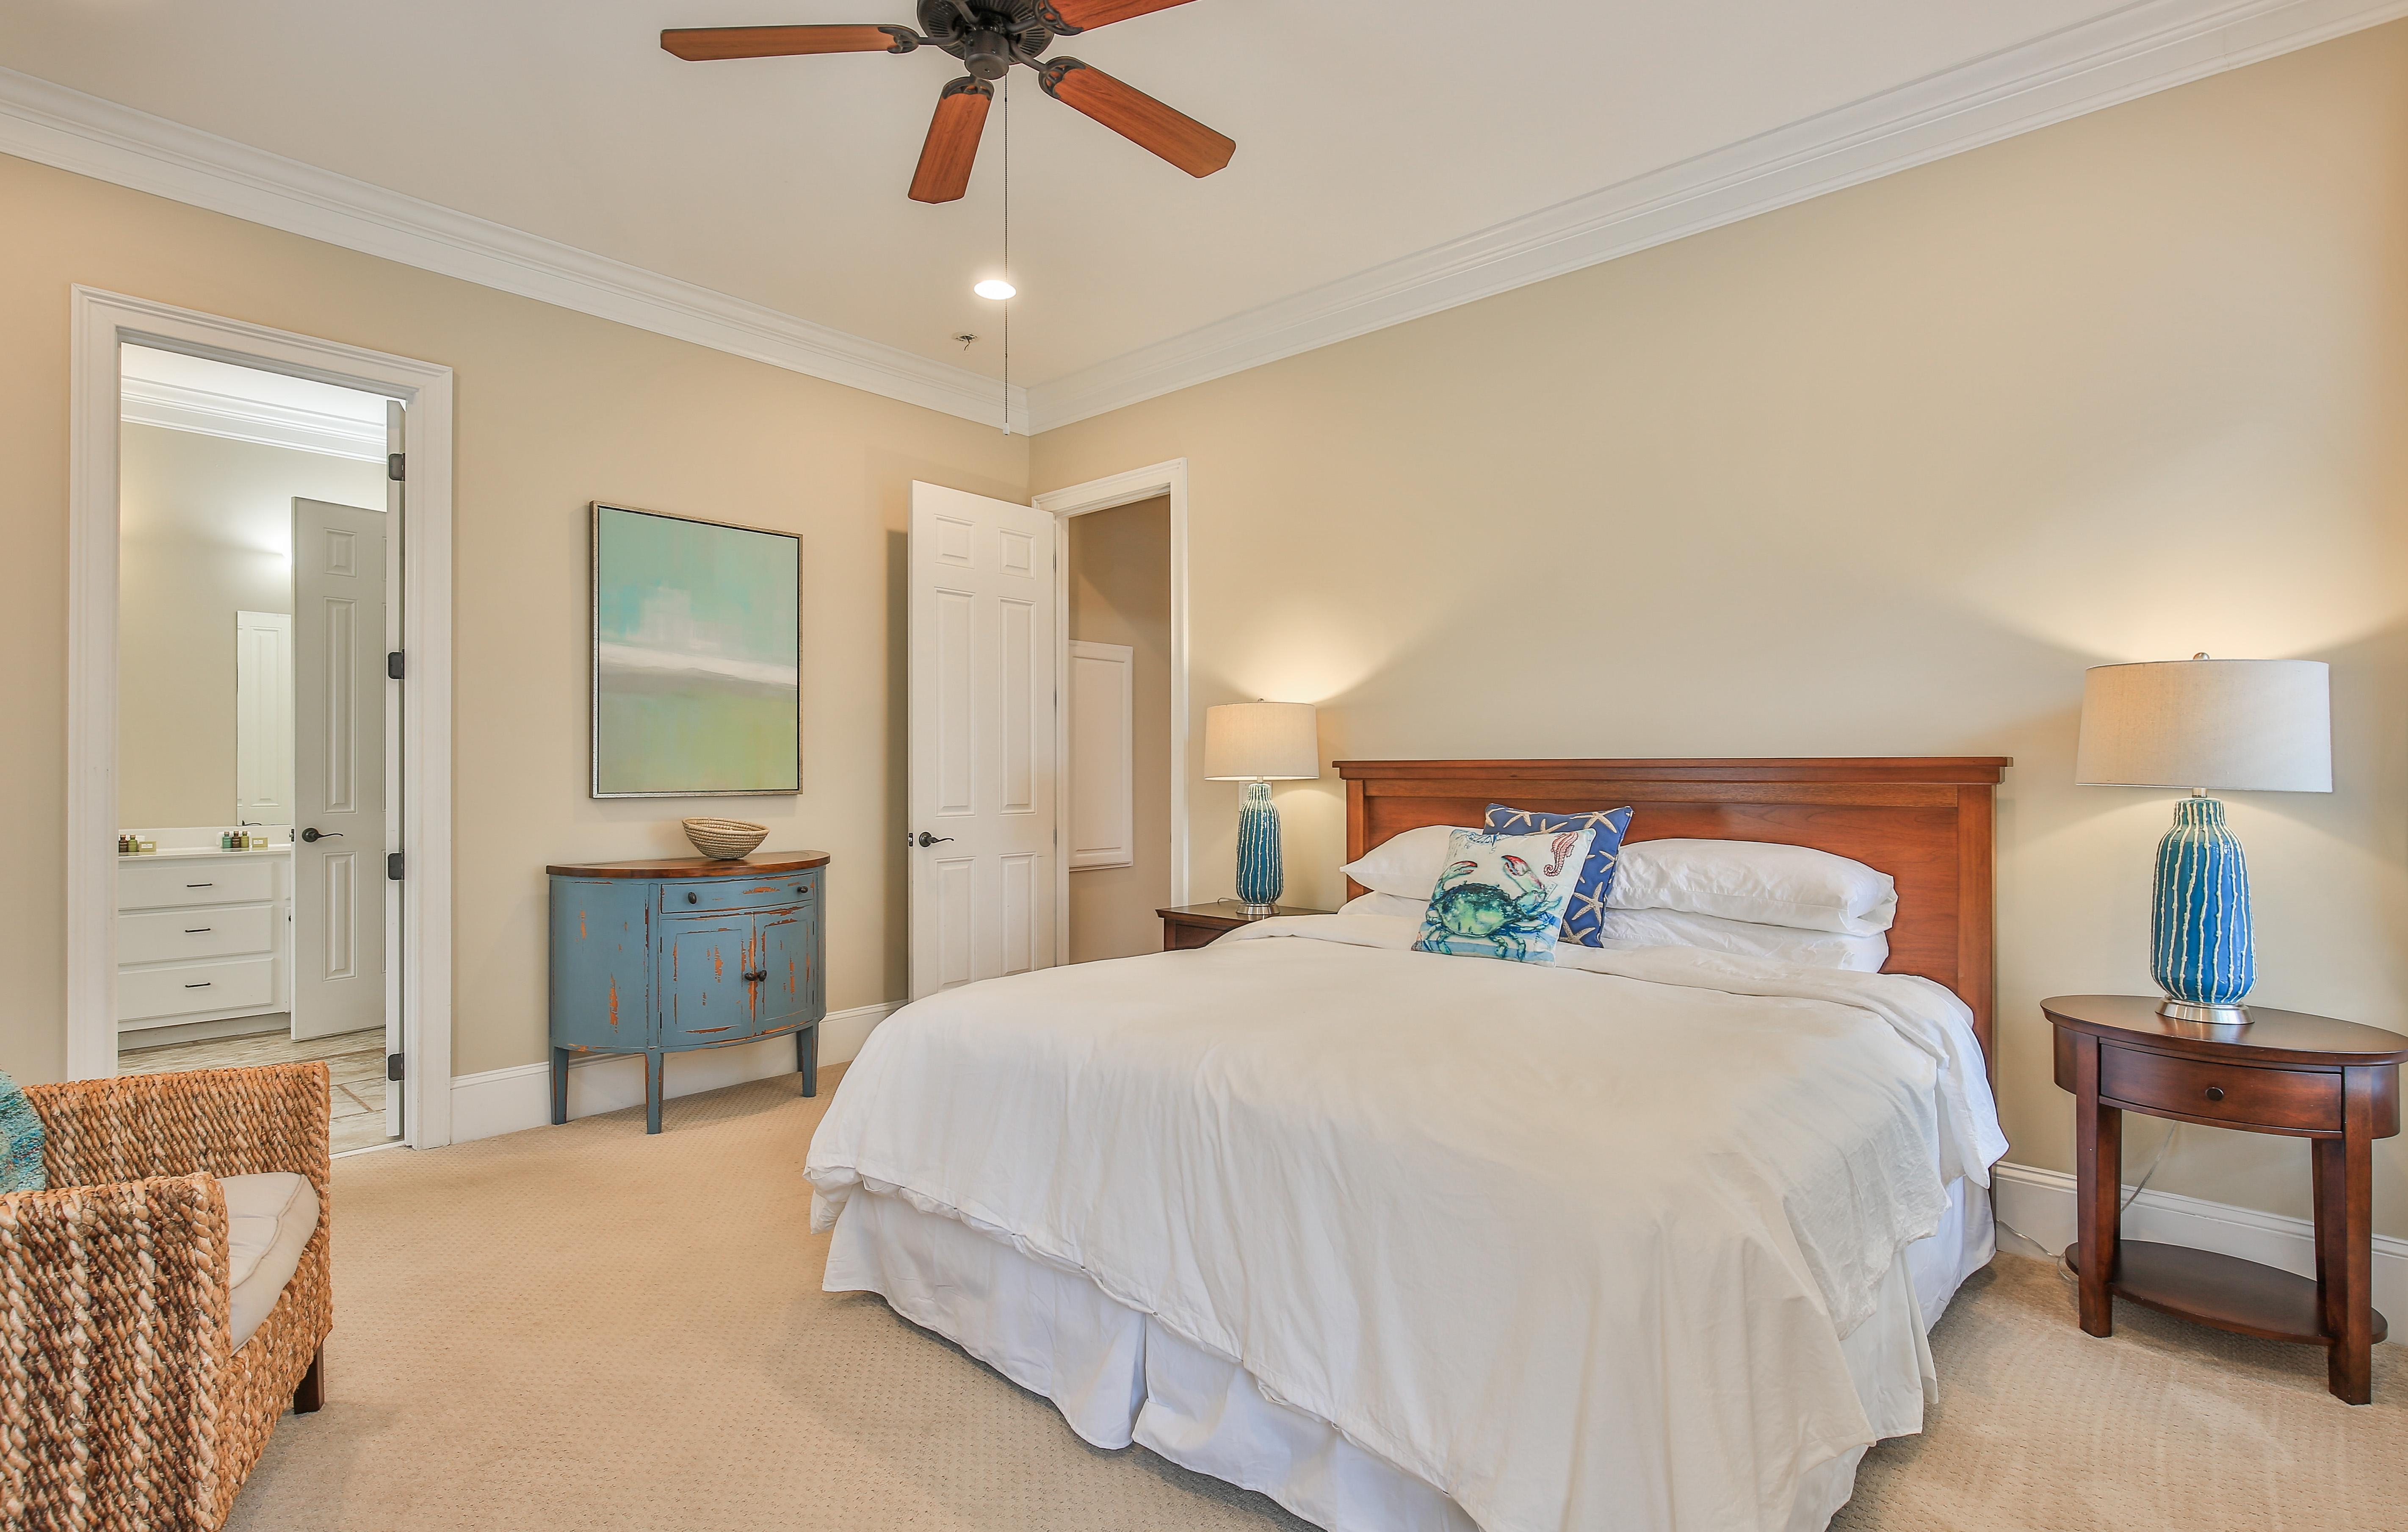 The Okeanos 1008 E Ashley Ave Master Bedroom